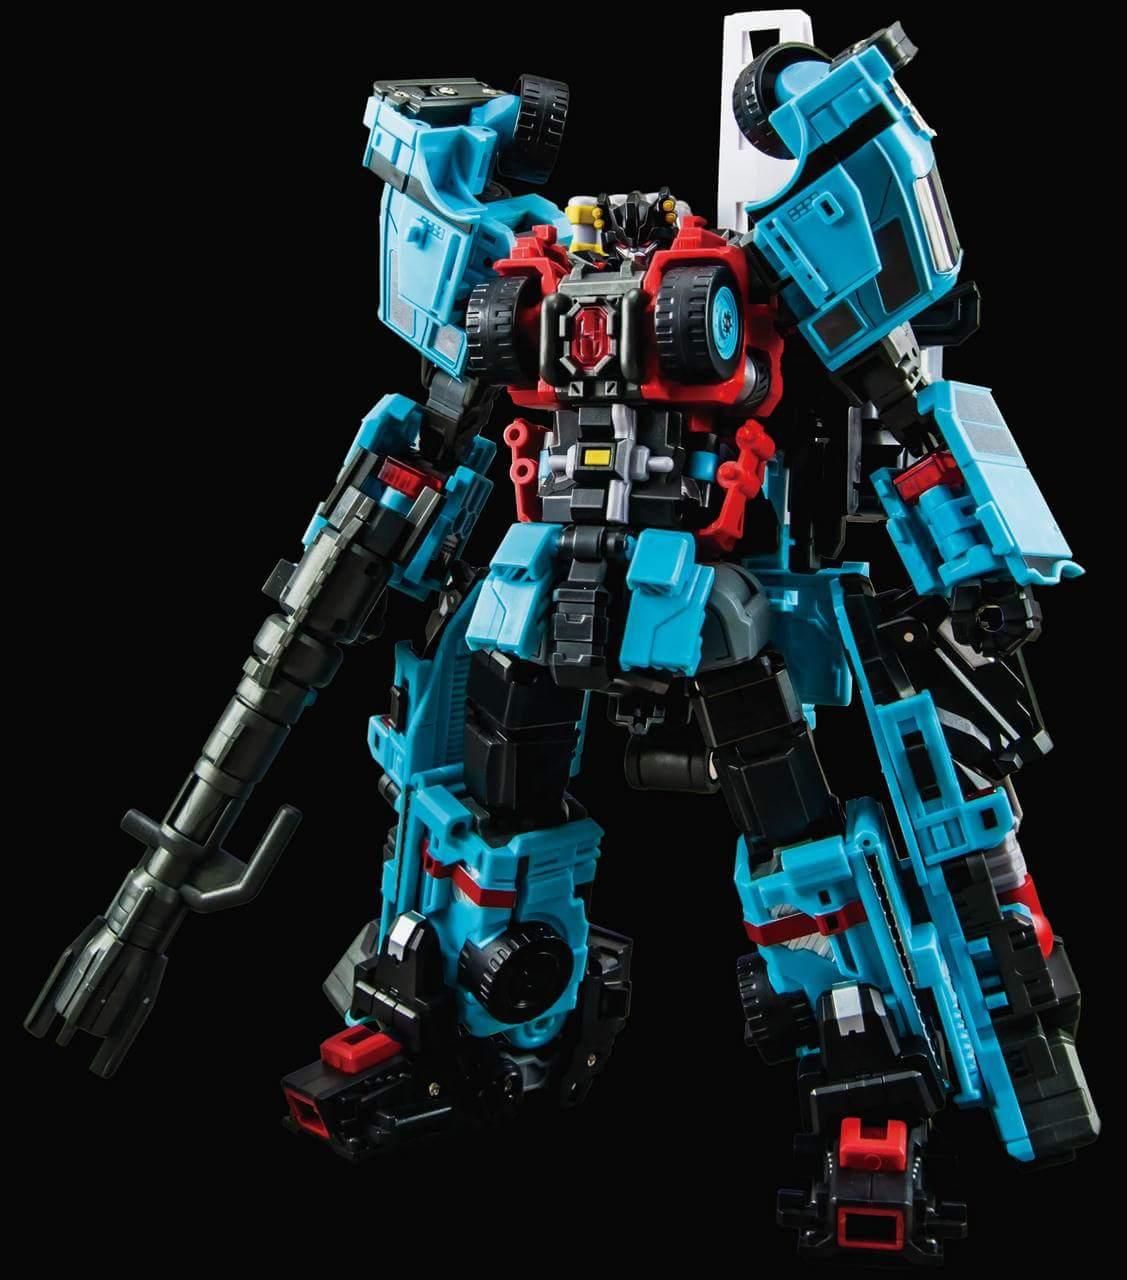 [MakeToys] Produit Tiers - Jouet MTCM-04 Guardia (aka Protectobots - Defensor/Defenso) - Page 4 6GaGsBQu